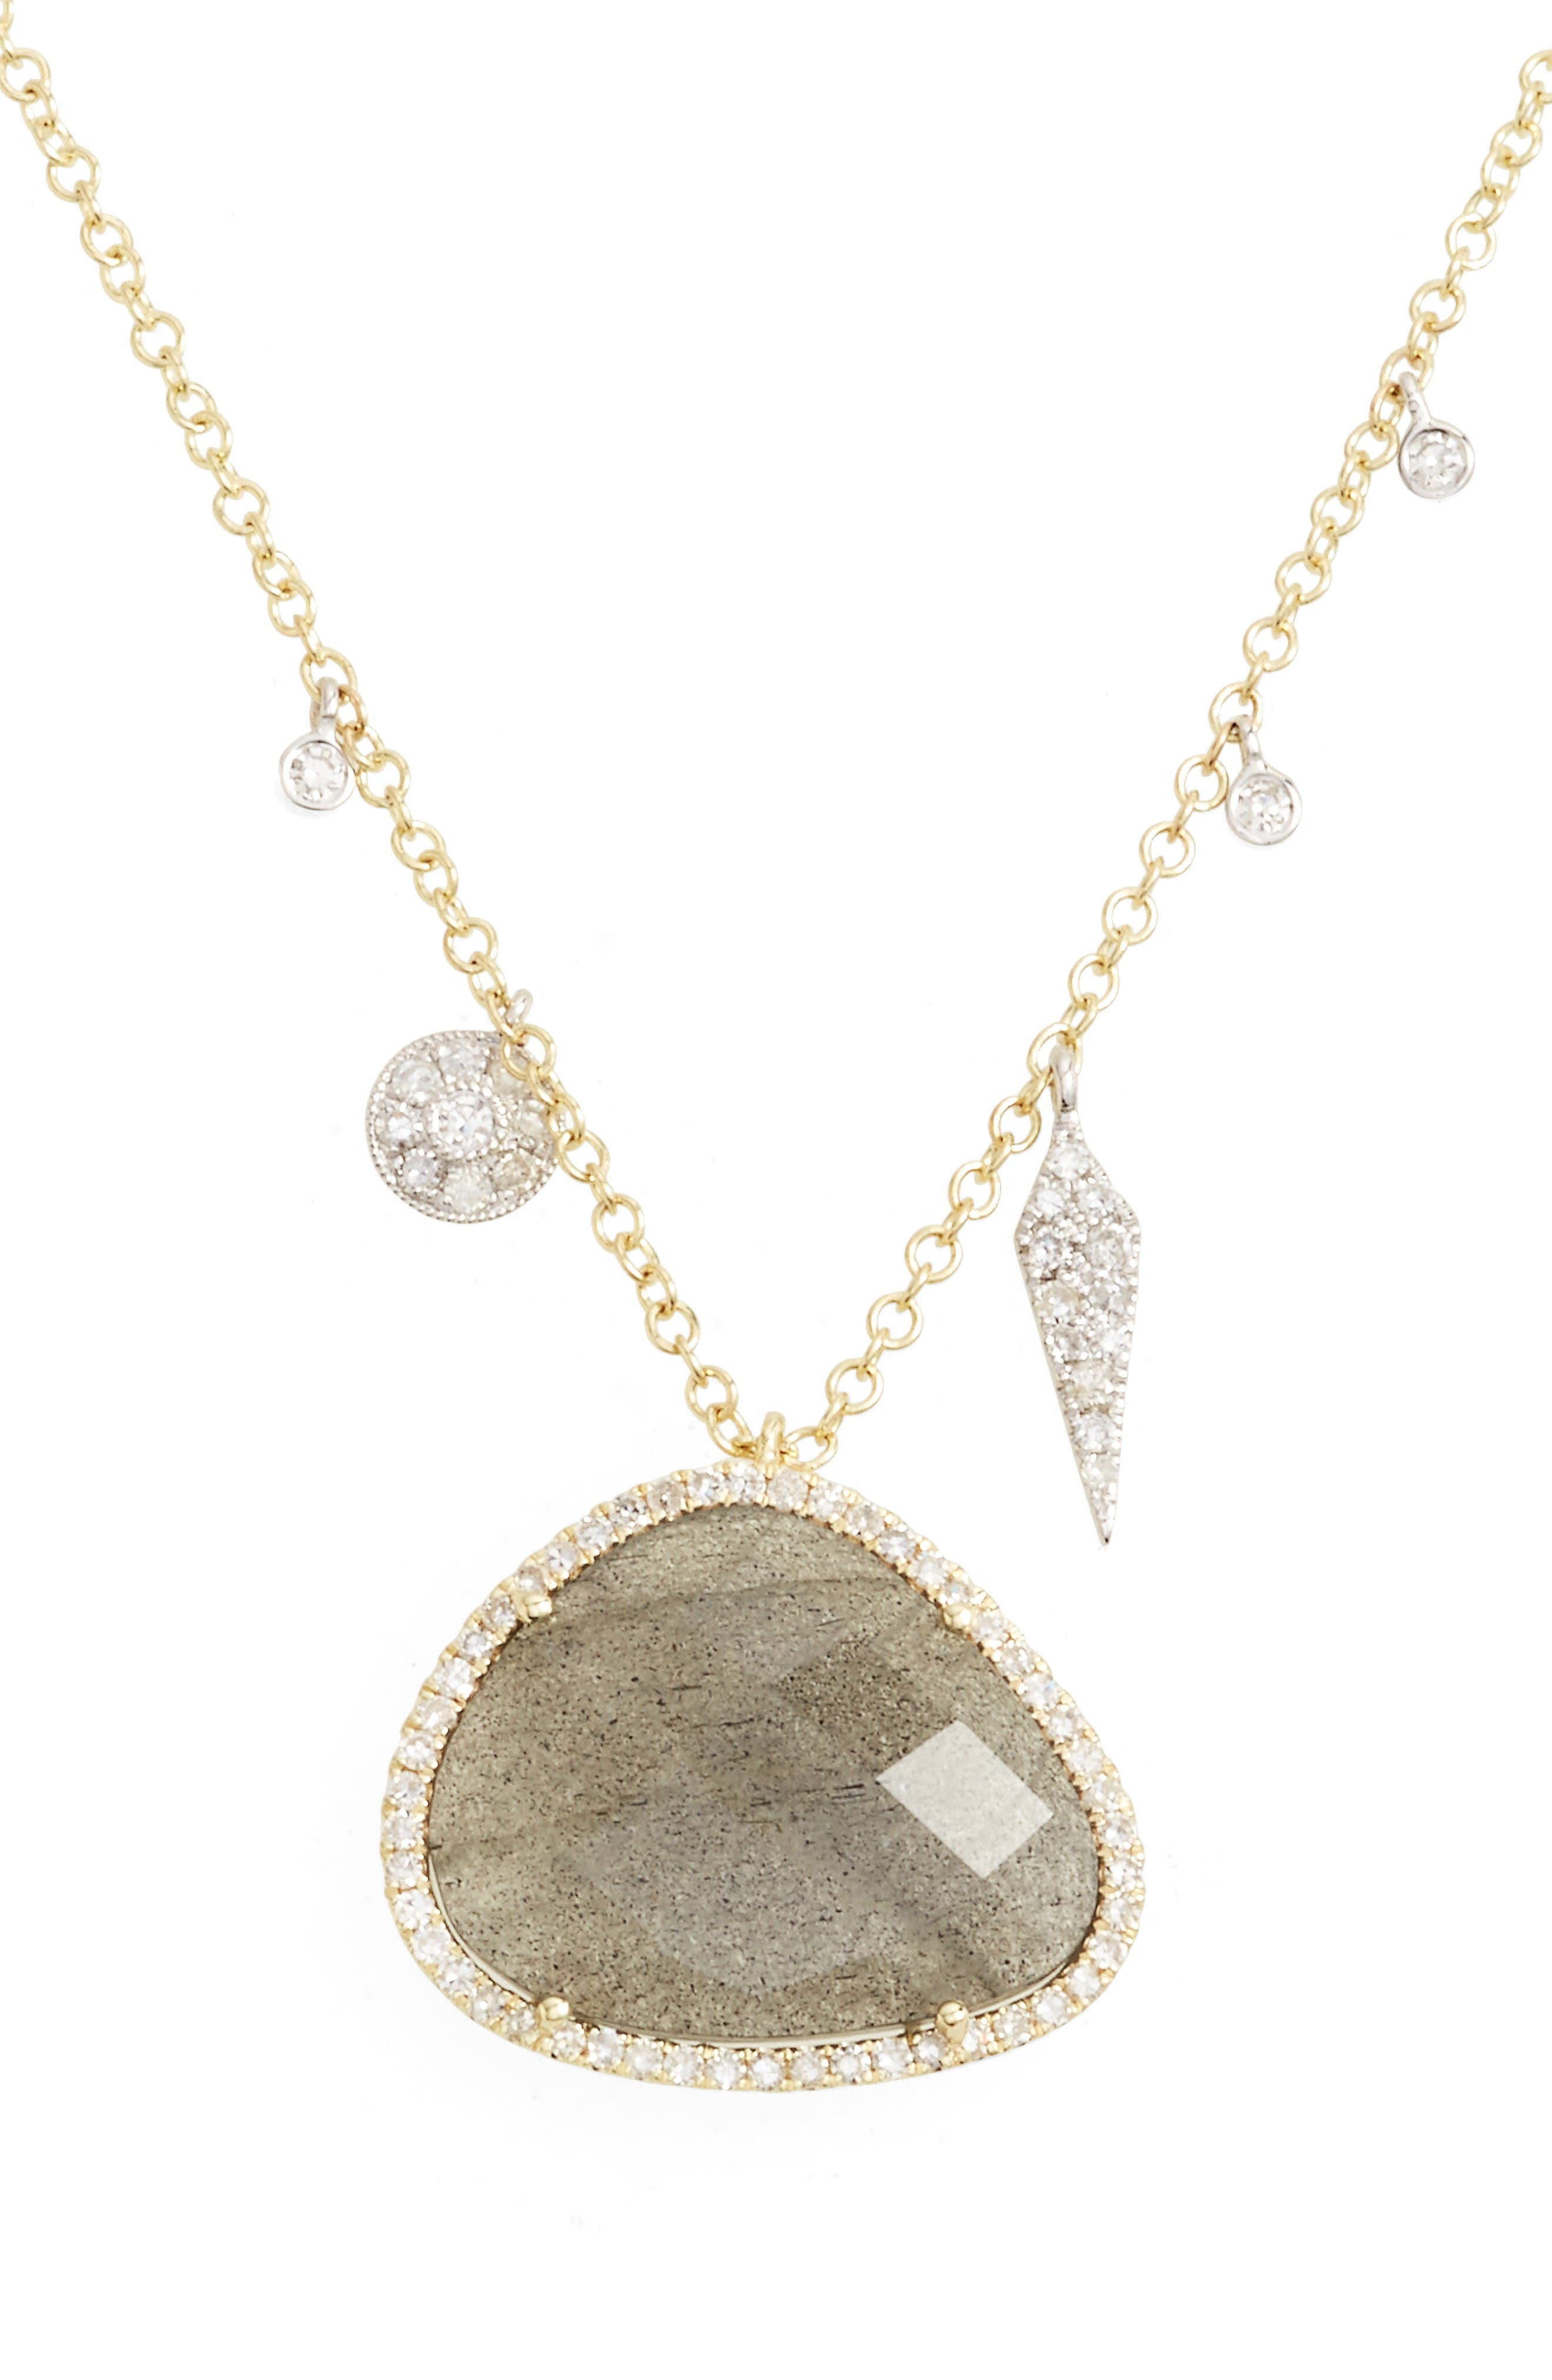 Meira T Jewelry Diamond & Semiprecious Stone Pendant Necklace